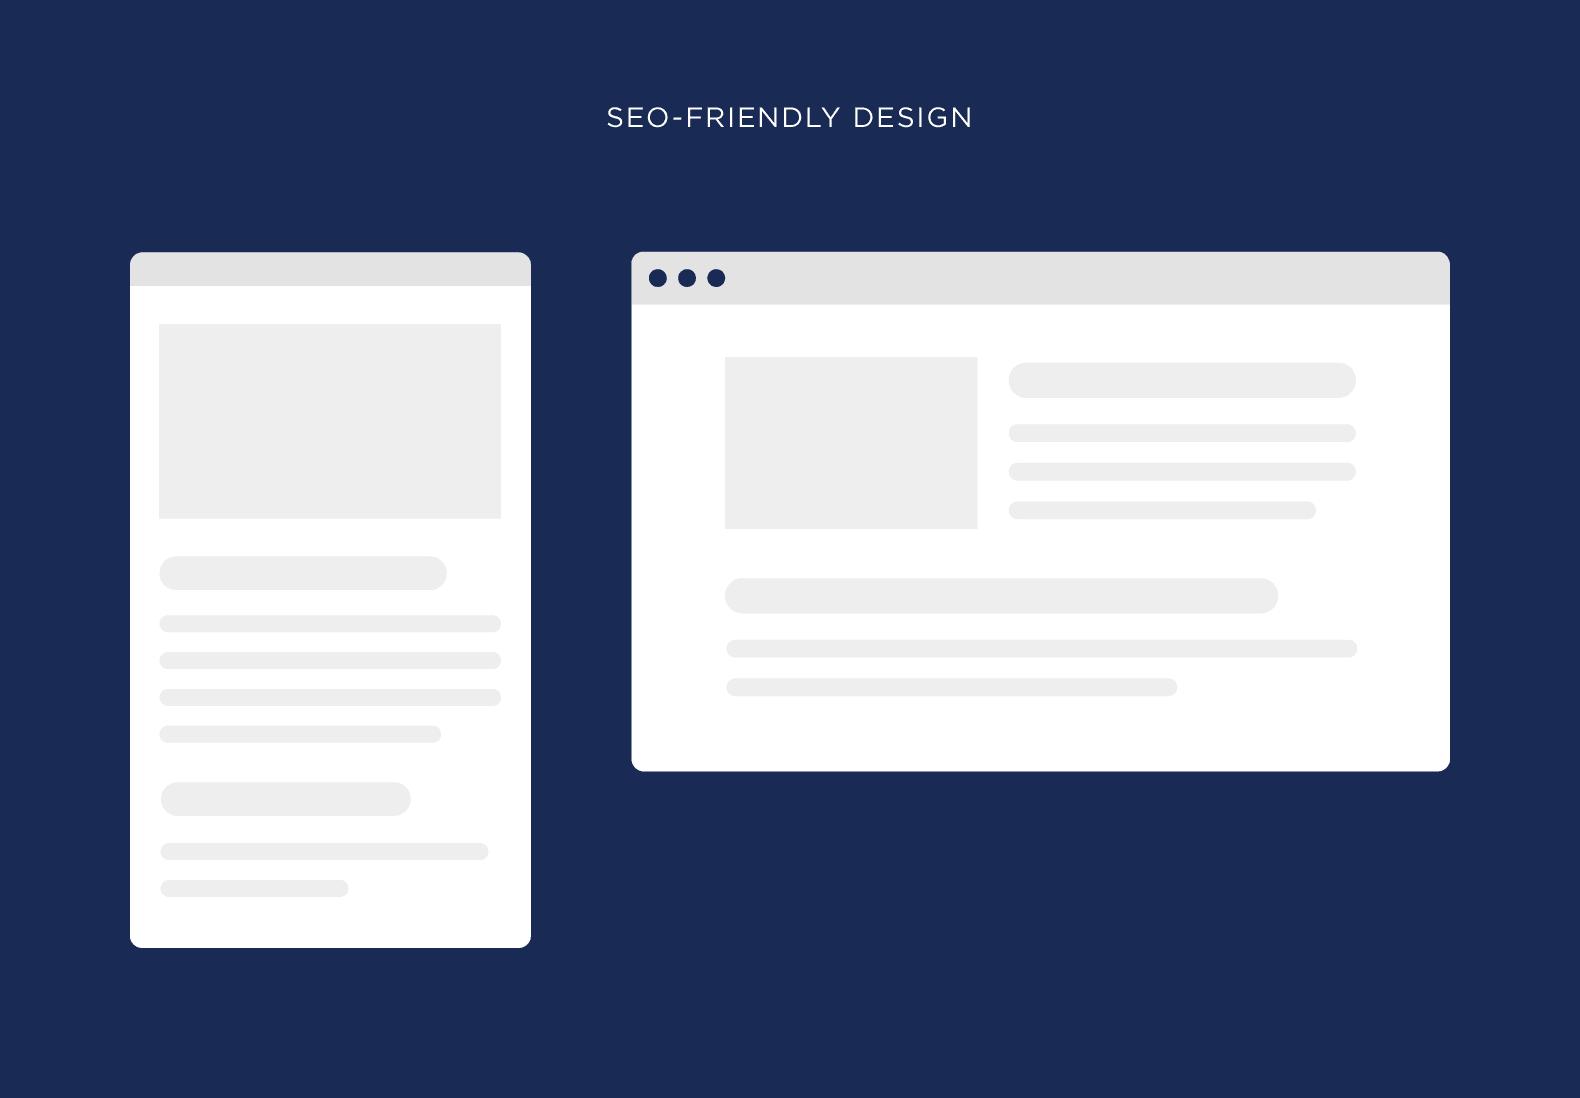 SEO-friendly design